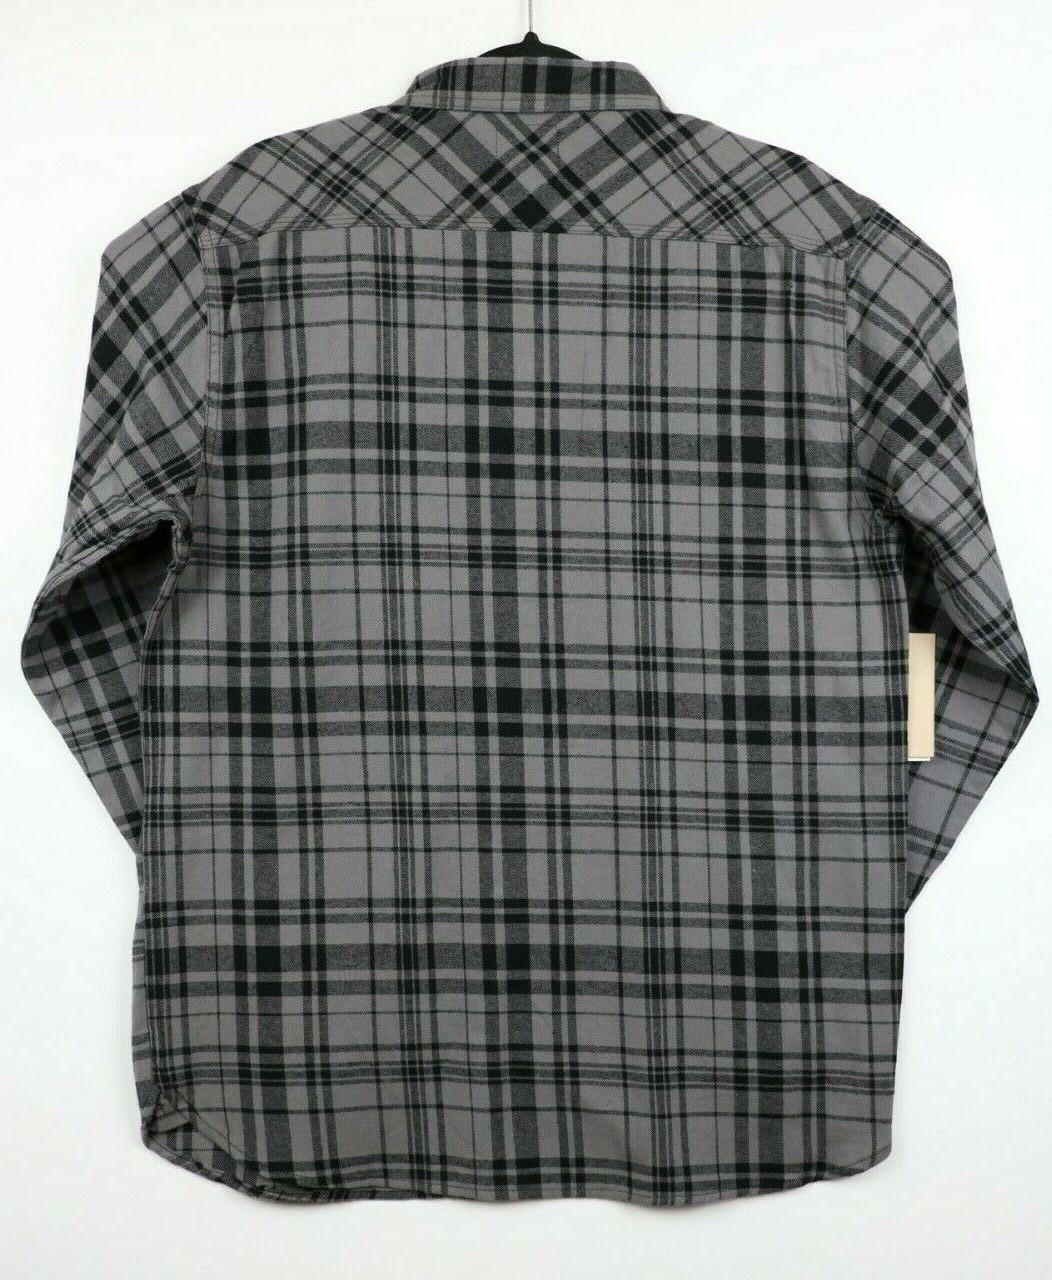 NWT Large Long Plaid Shirt